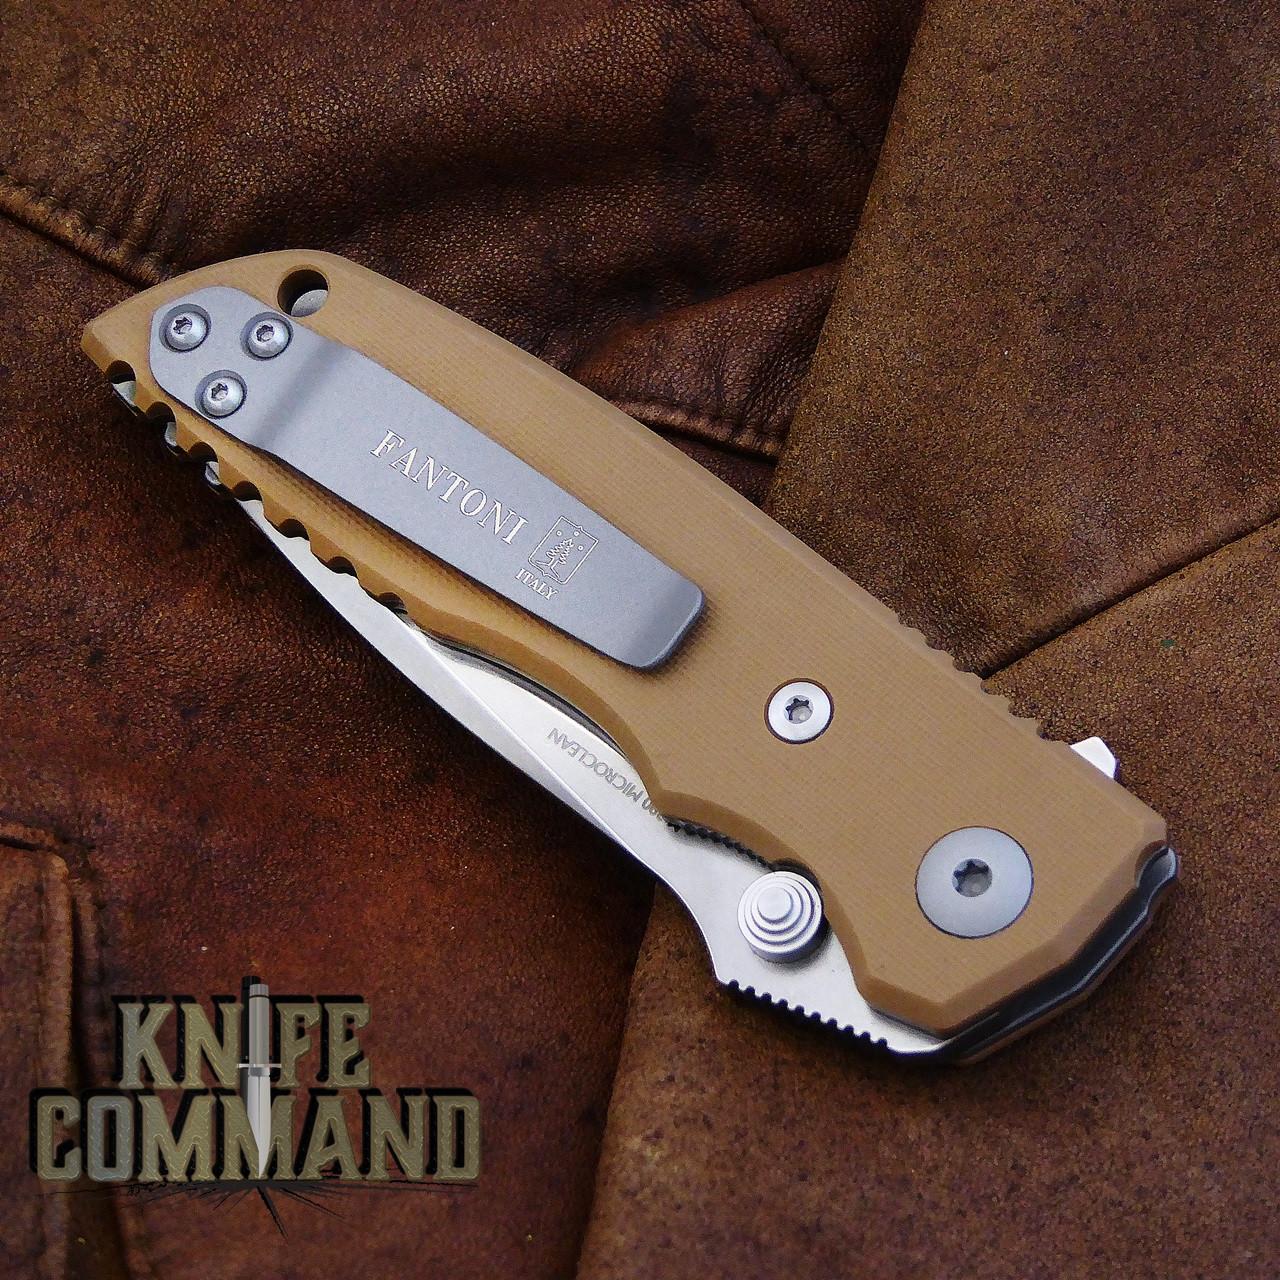 Fantoni HB 03 M390 William Harsey Combat Folder Tactical Knife Coyote Tan.  Reversible pocket clip.